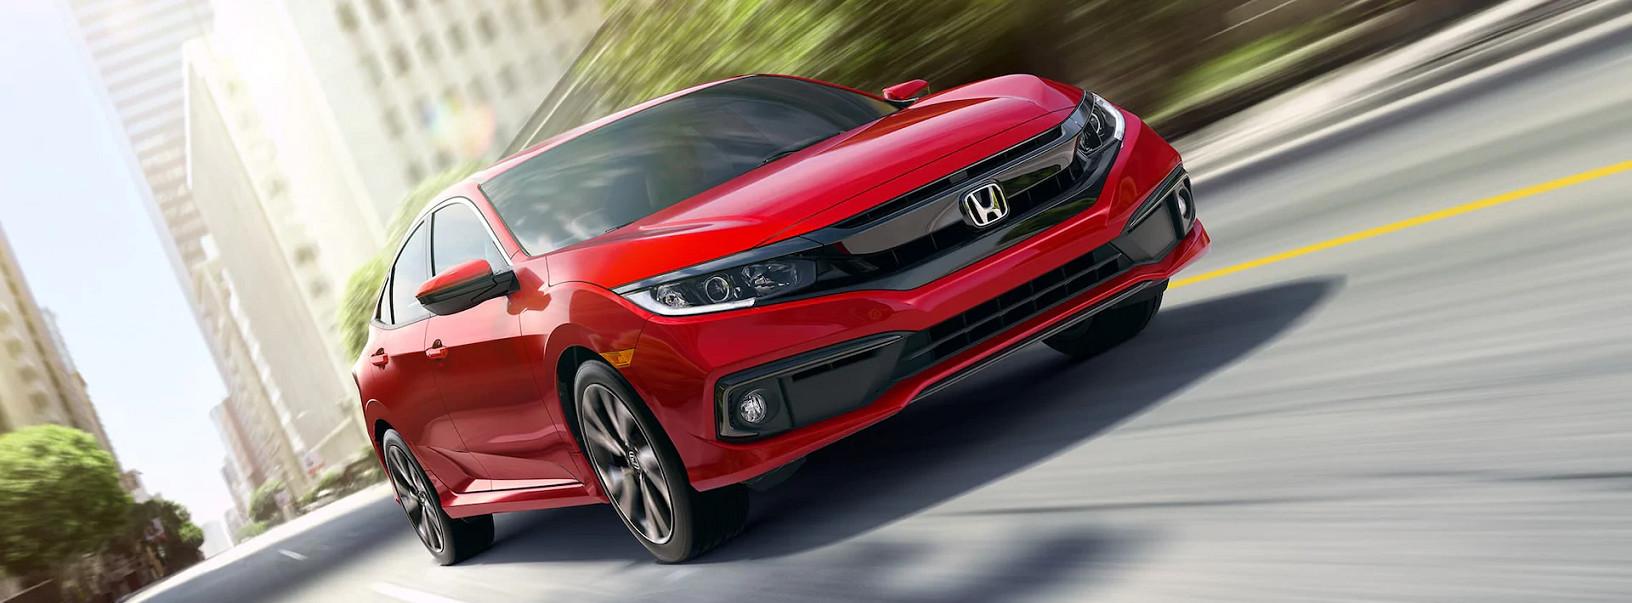 2020 Honda Civic Leasing near Aiken, SC